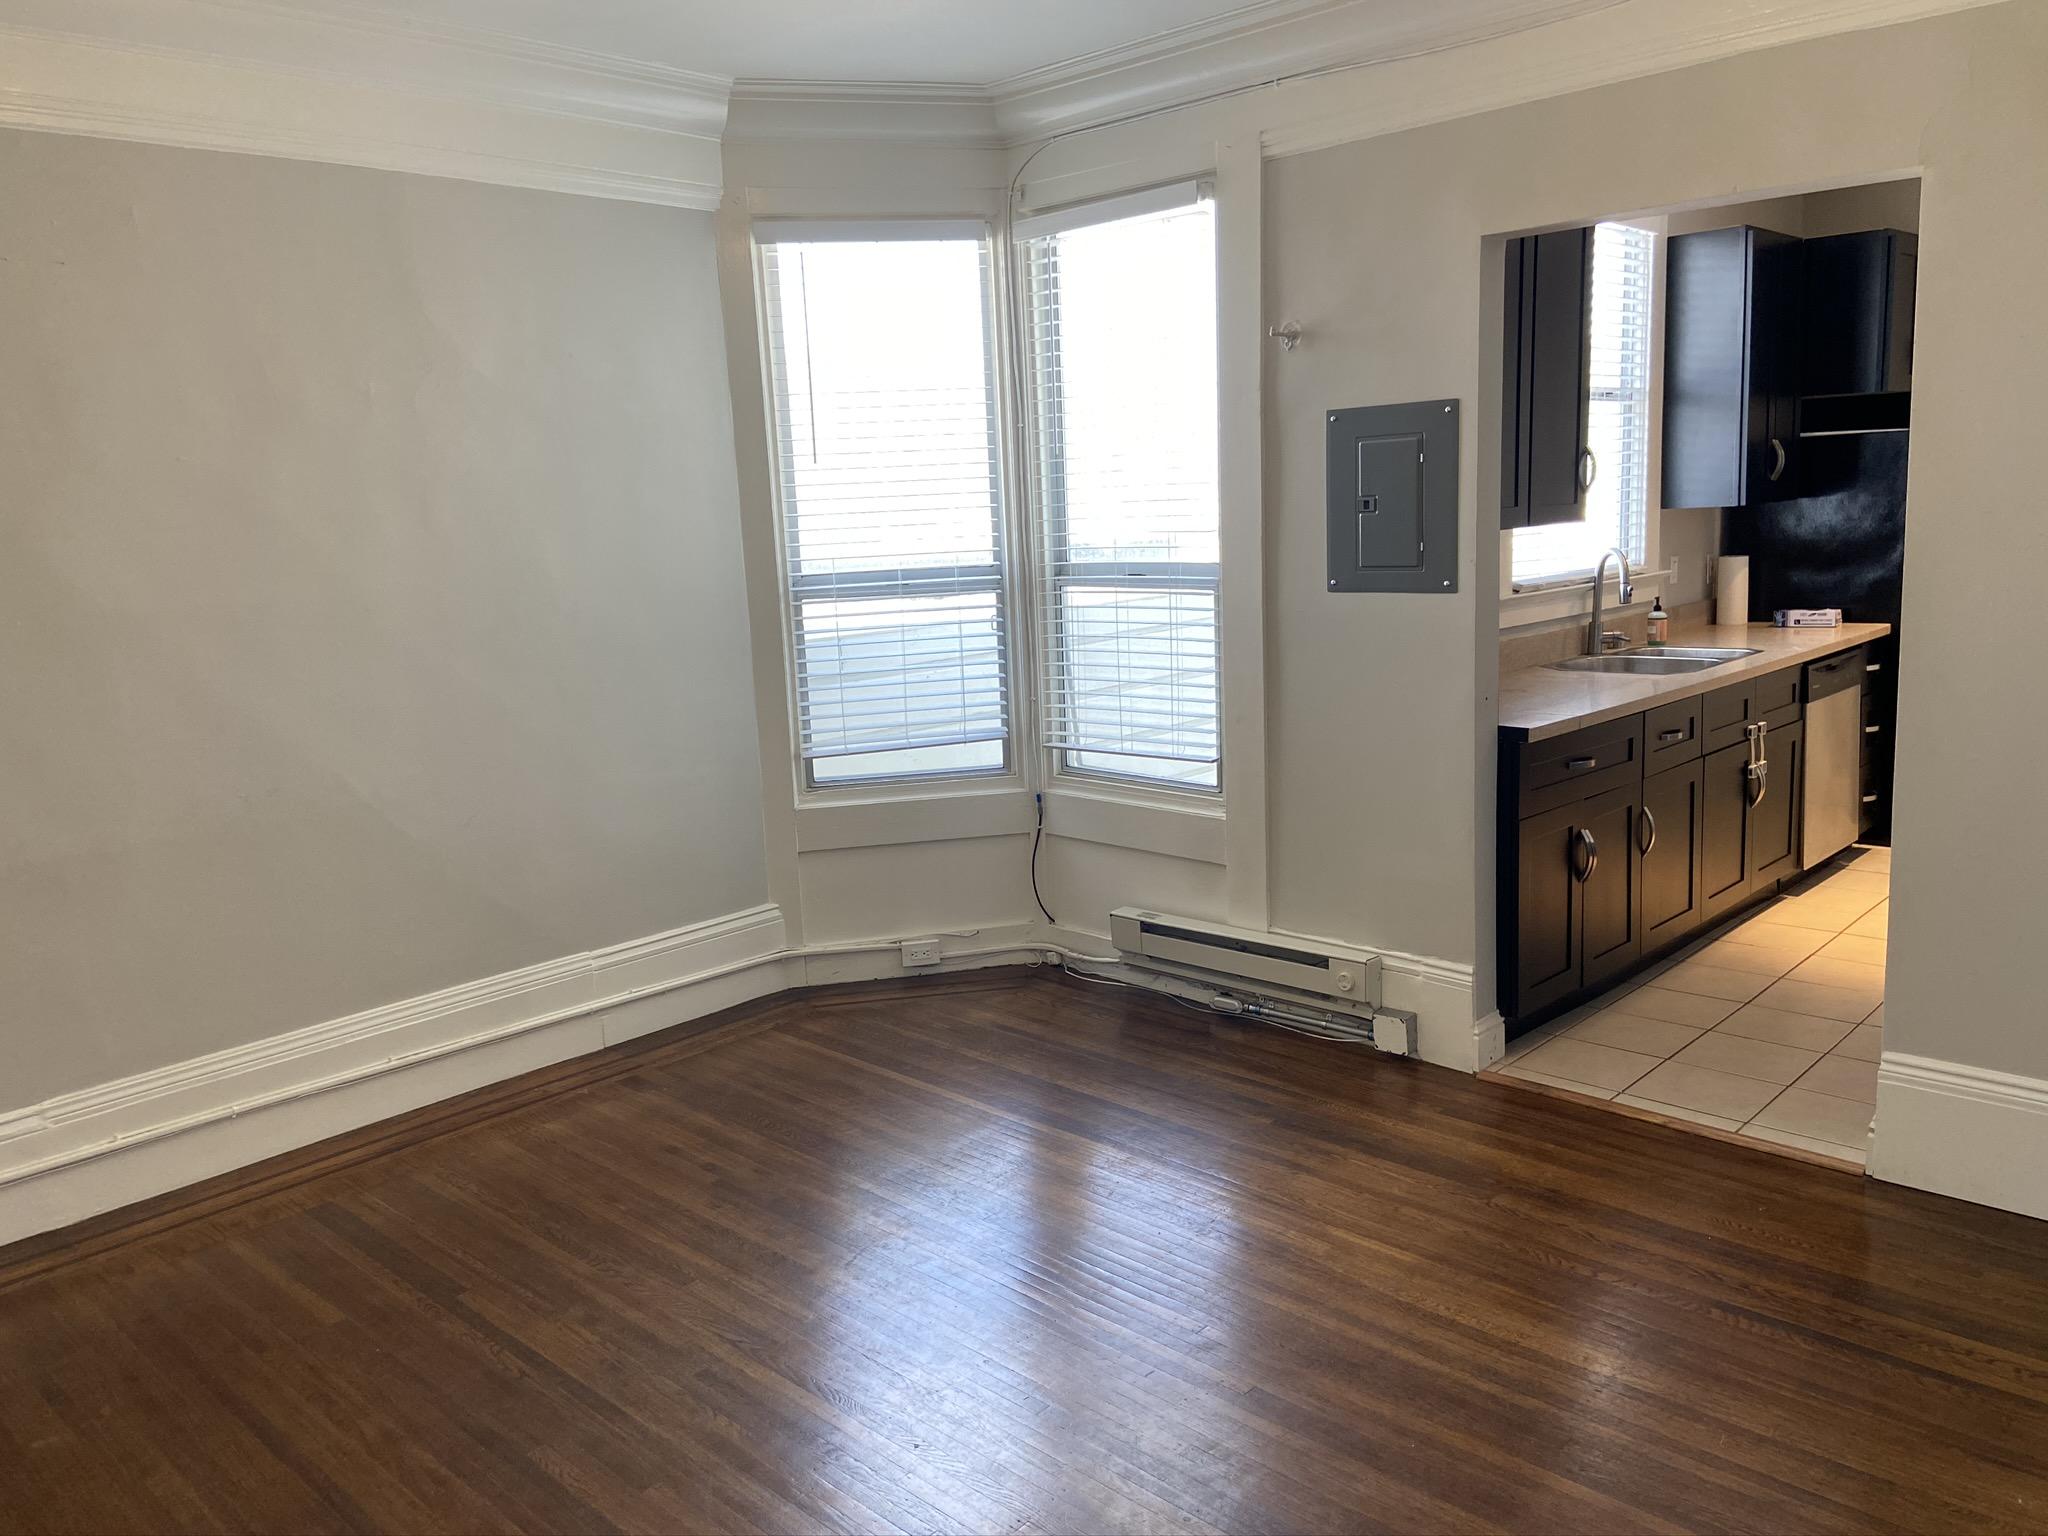 1360.11 Living Room